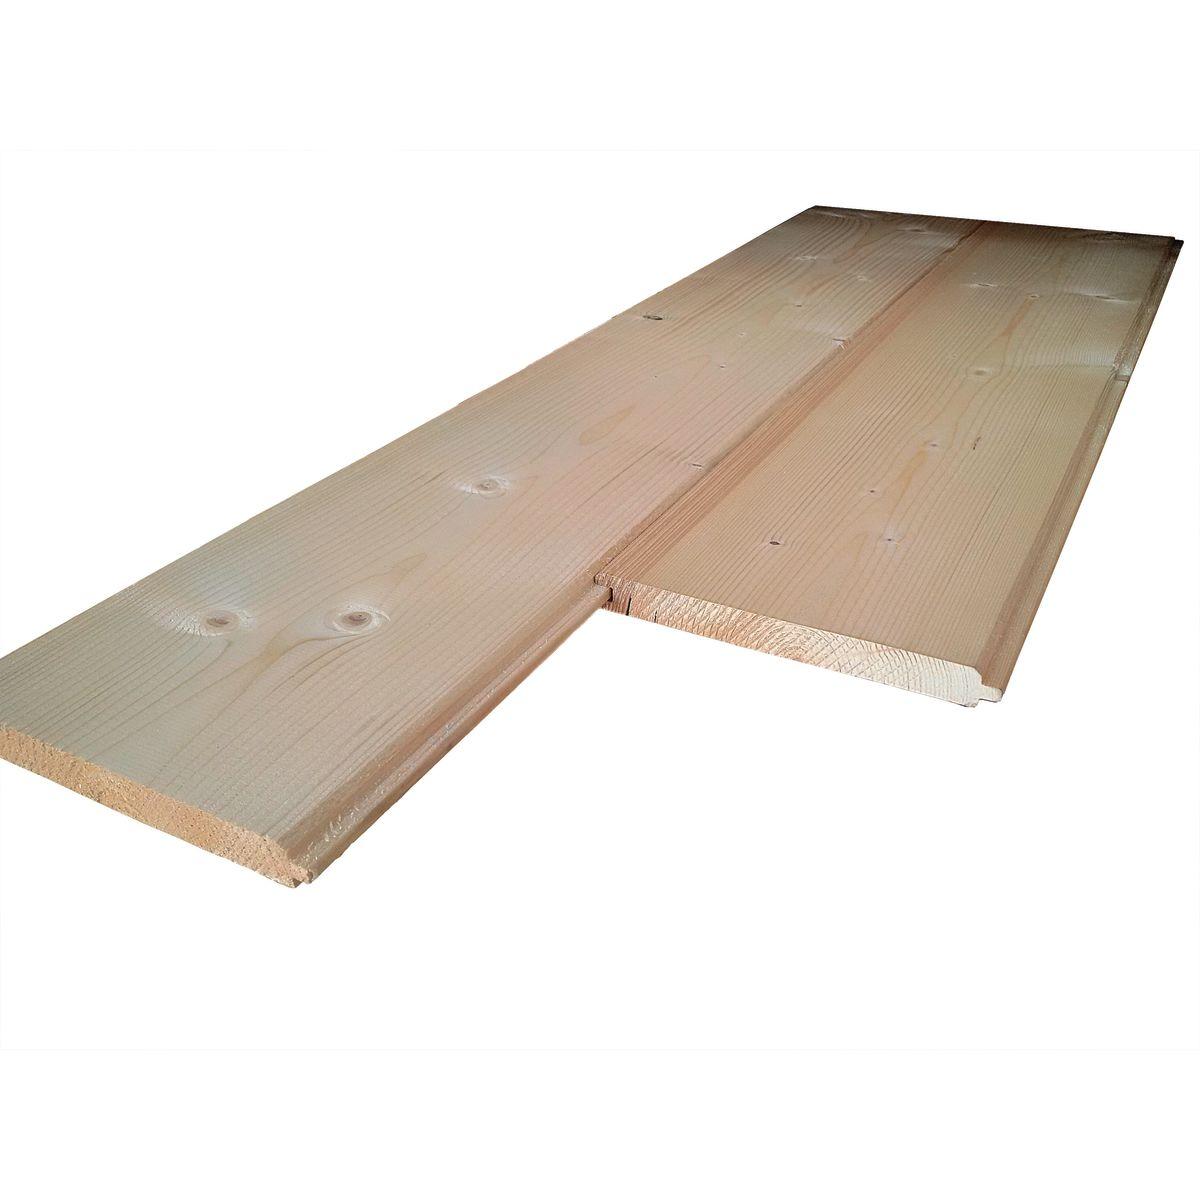 Sdraio da giardino leroy merlin affordable sdraio da for Sdraio in legno leroy merlin